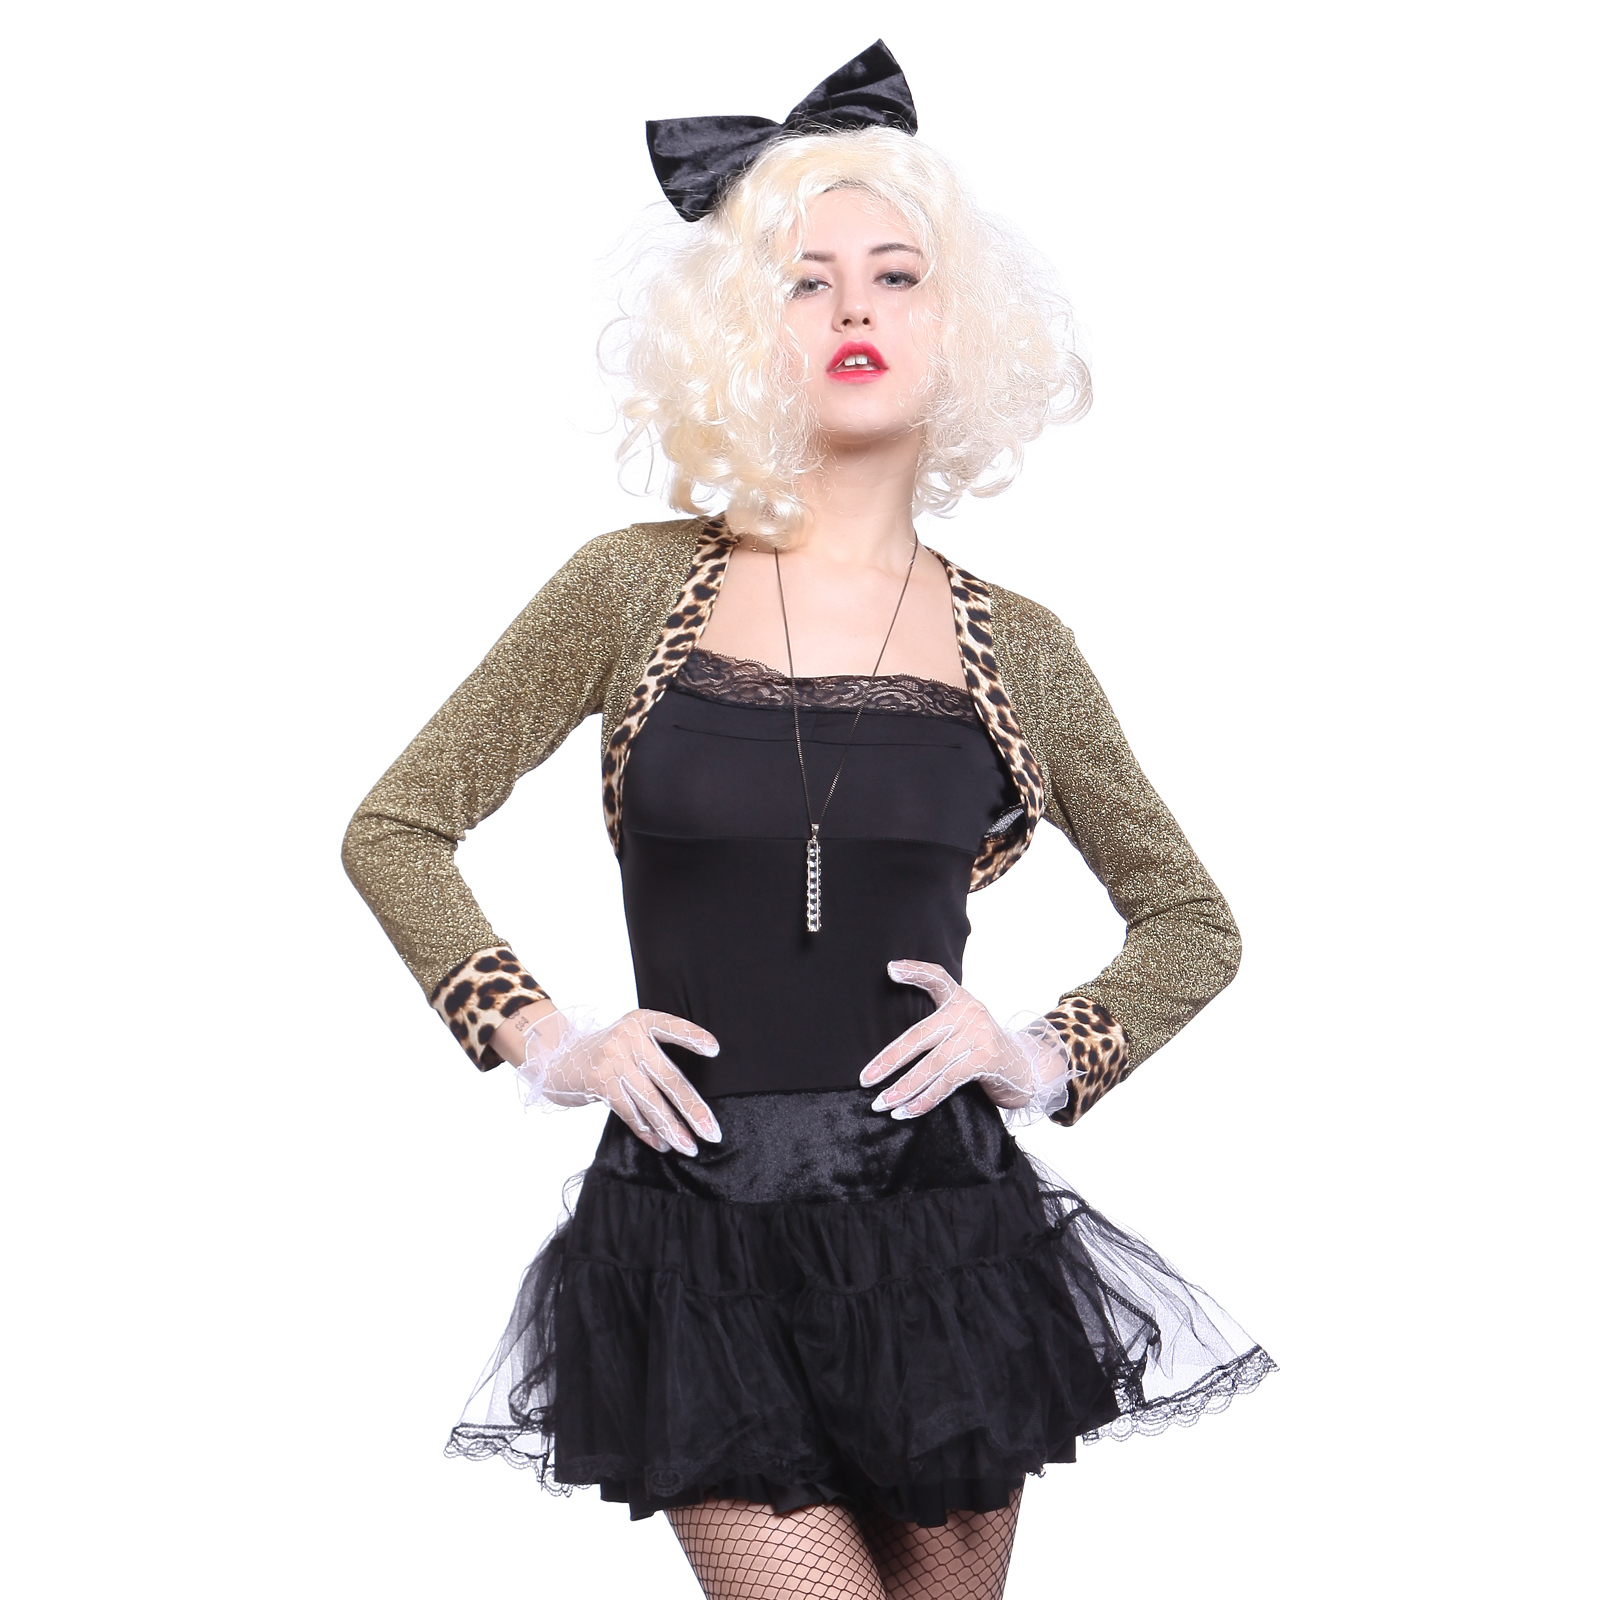 Wild child madonna 80s ladies fancy dress 1980s costume - 80er jahre outfit ideen ...